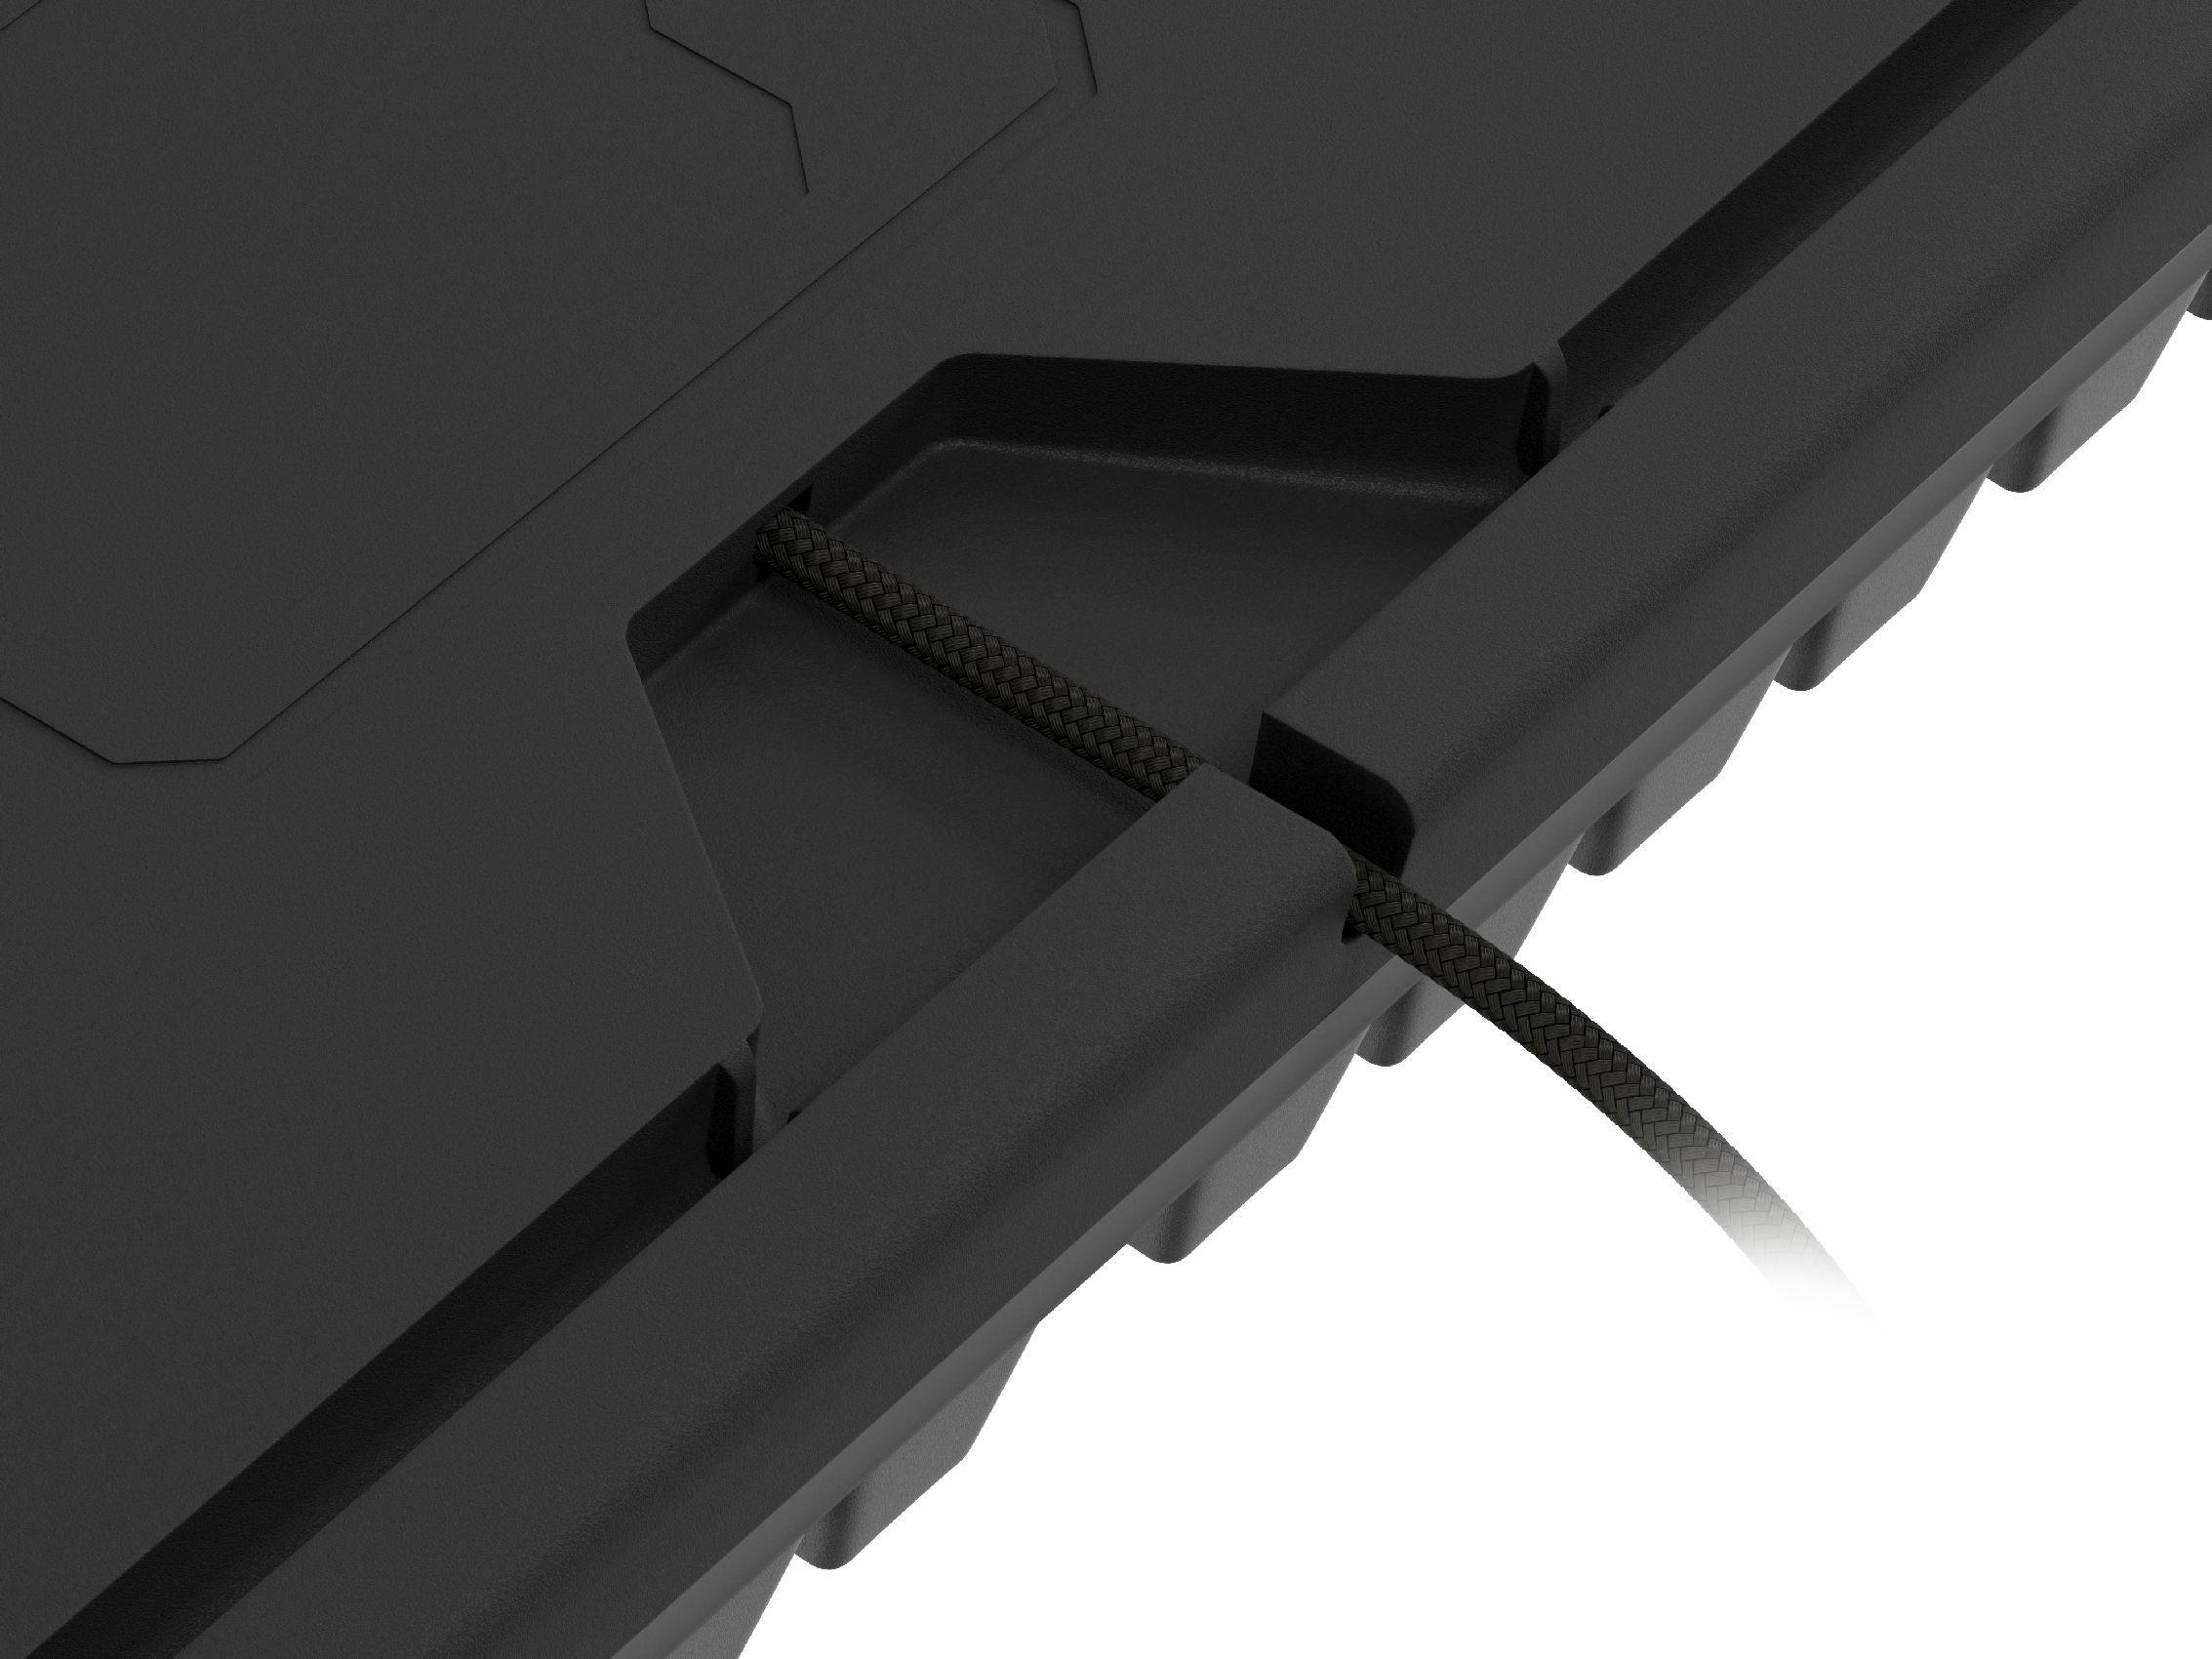 Гейминг клавиатура Genesis  - Thor 300, механична, черна, за PC - 4